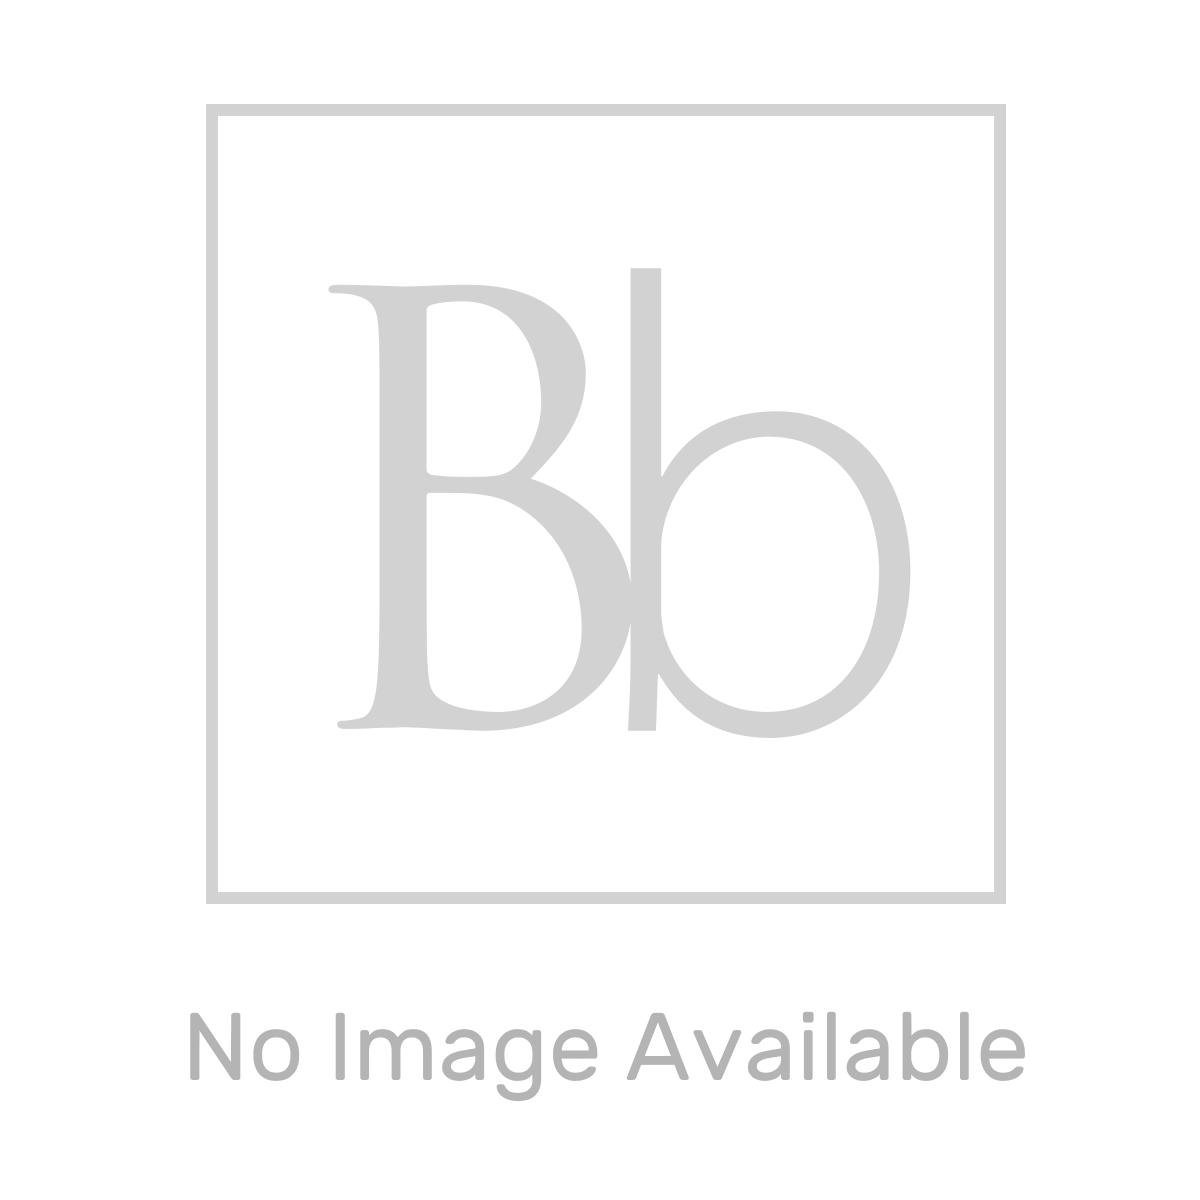 Aquadart Rectangular 1200 x 700 Shower Tray Line Drawing